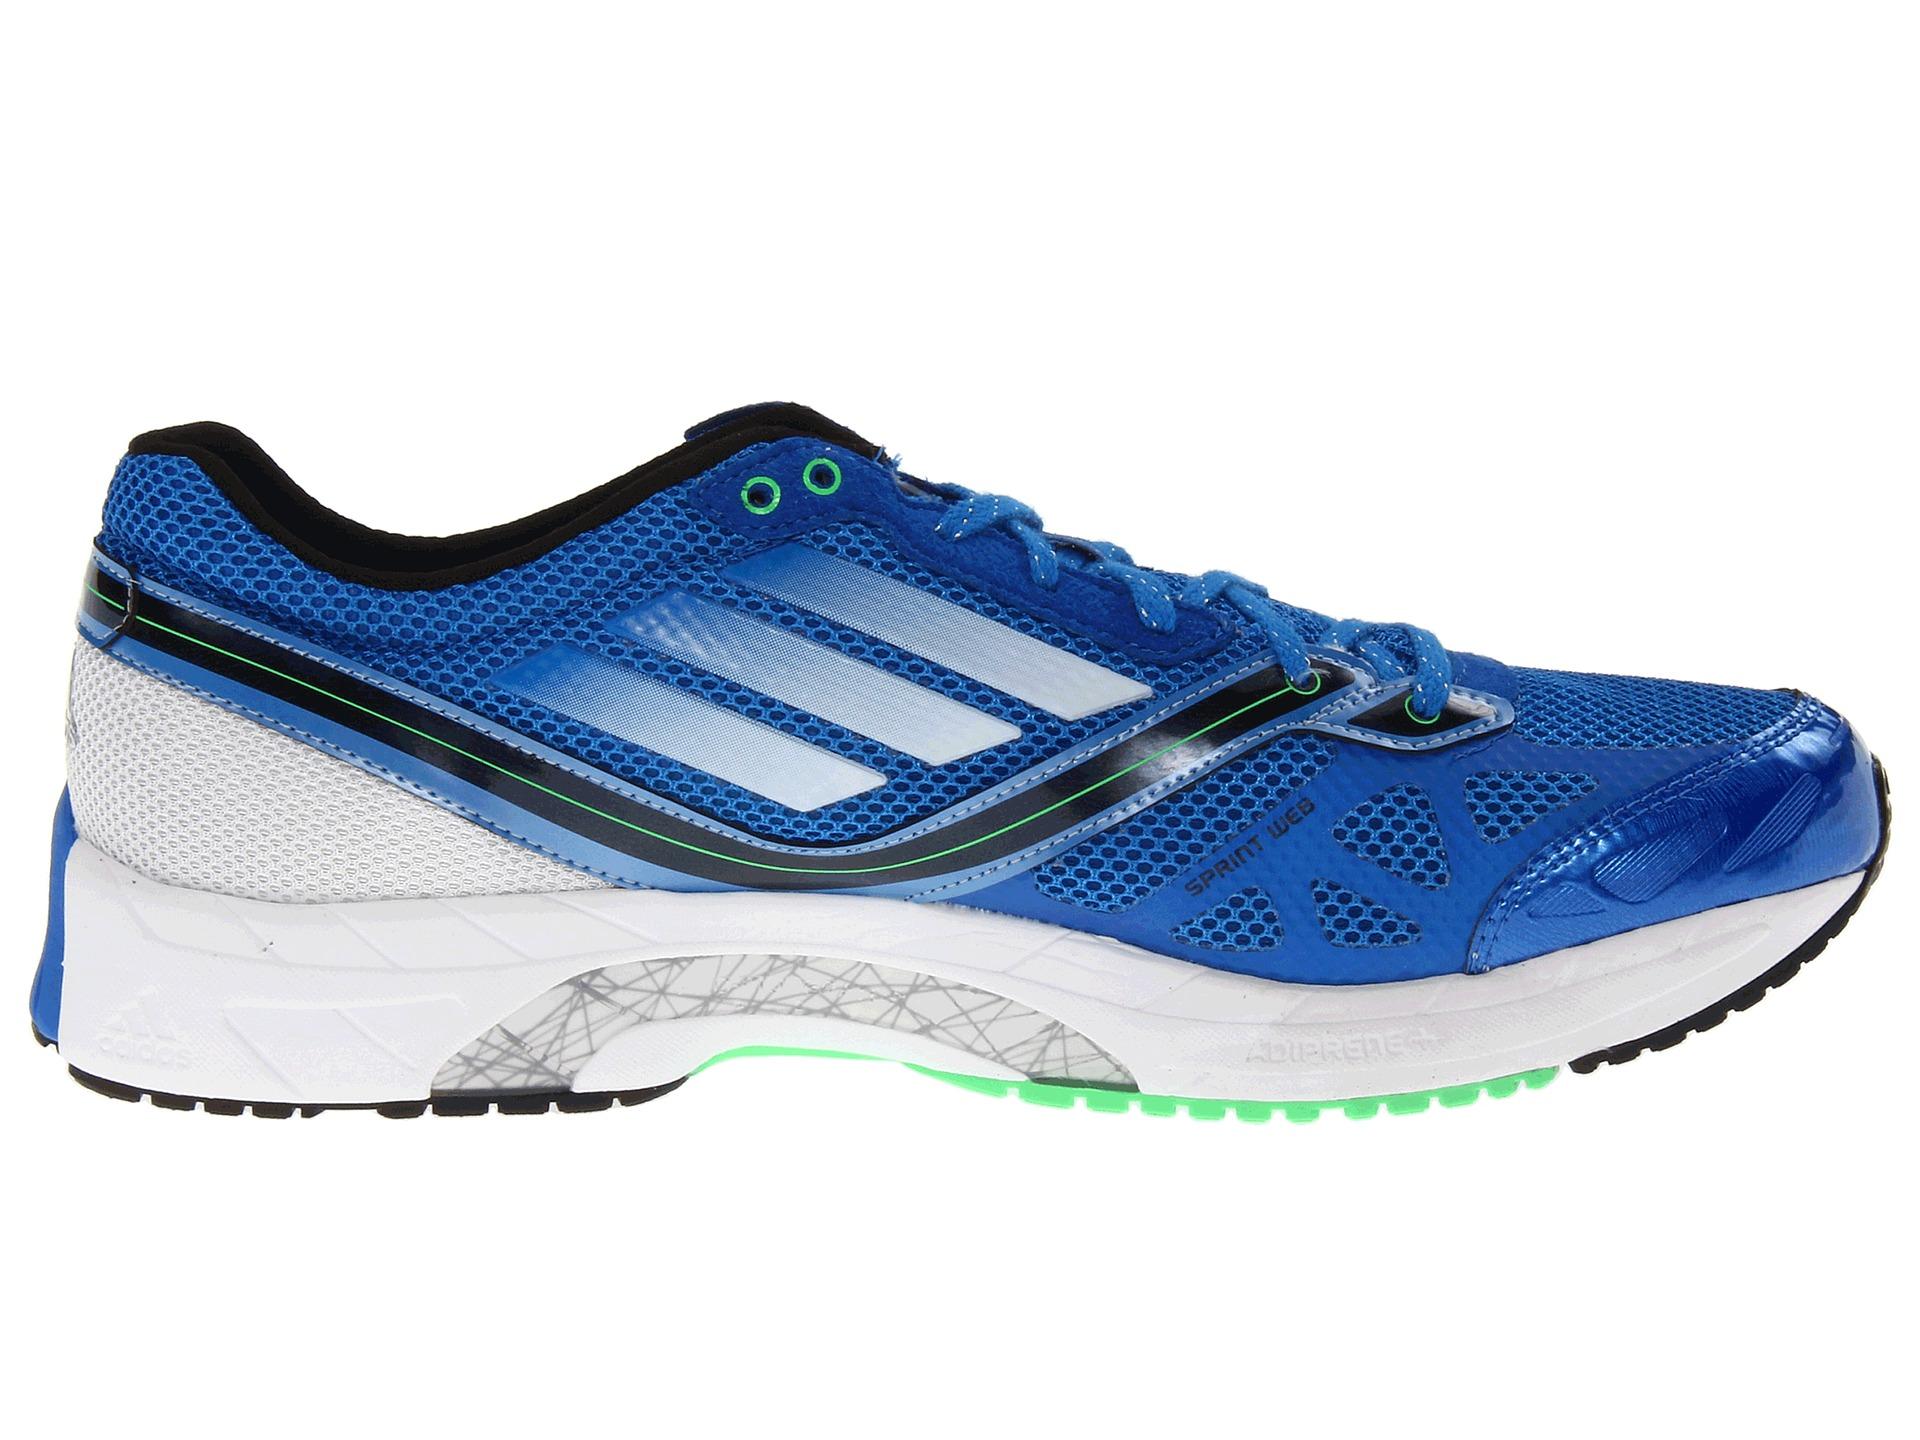 Pearl Izumi Running Shoes For Overpronators